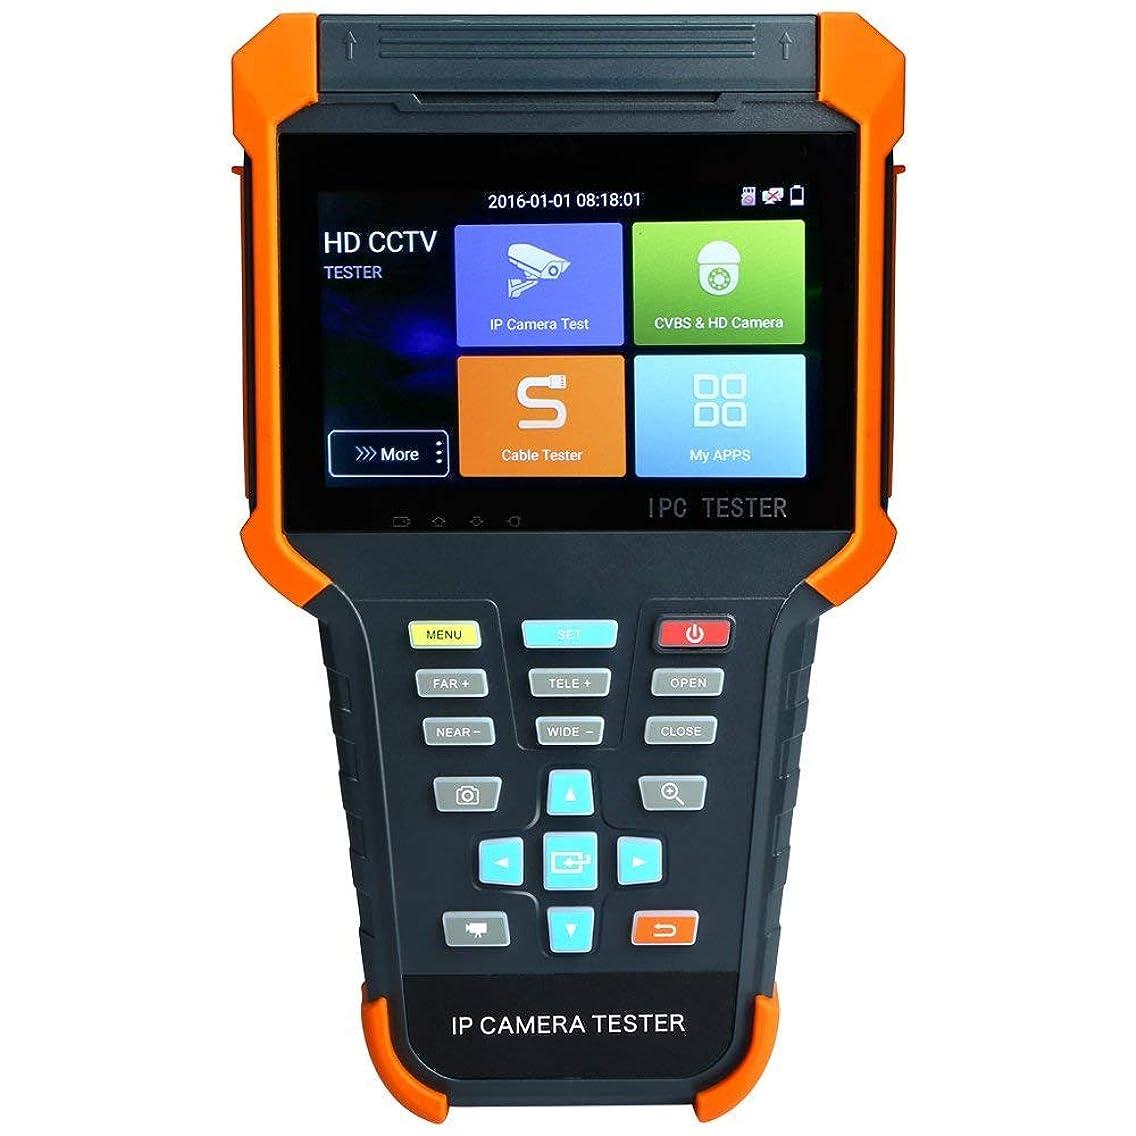 Precamview 4 Inch 6 in 1 H.265 4K IP HD CCTV Tester Monitor AHD CVI TVI SDI CVBS Camera Tester 8MP 5MP ONVIF WiFi RJ45 TDR PTZ POE 12V Output X4ADHS